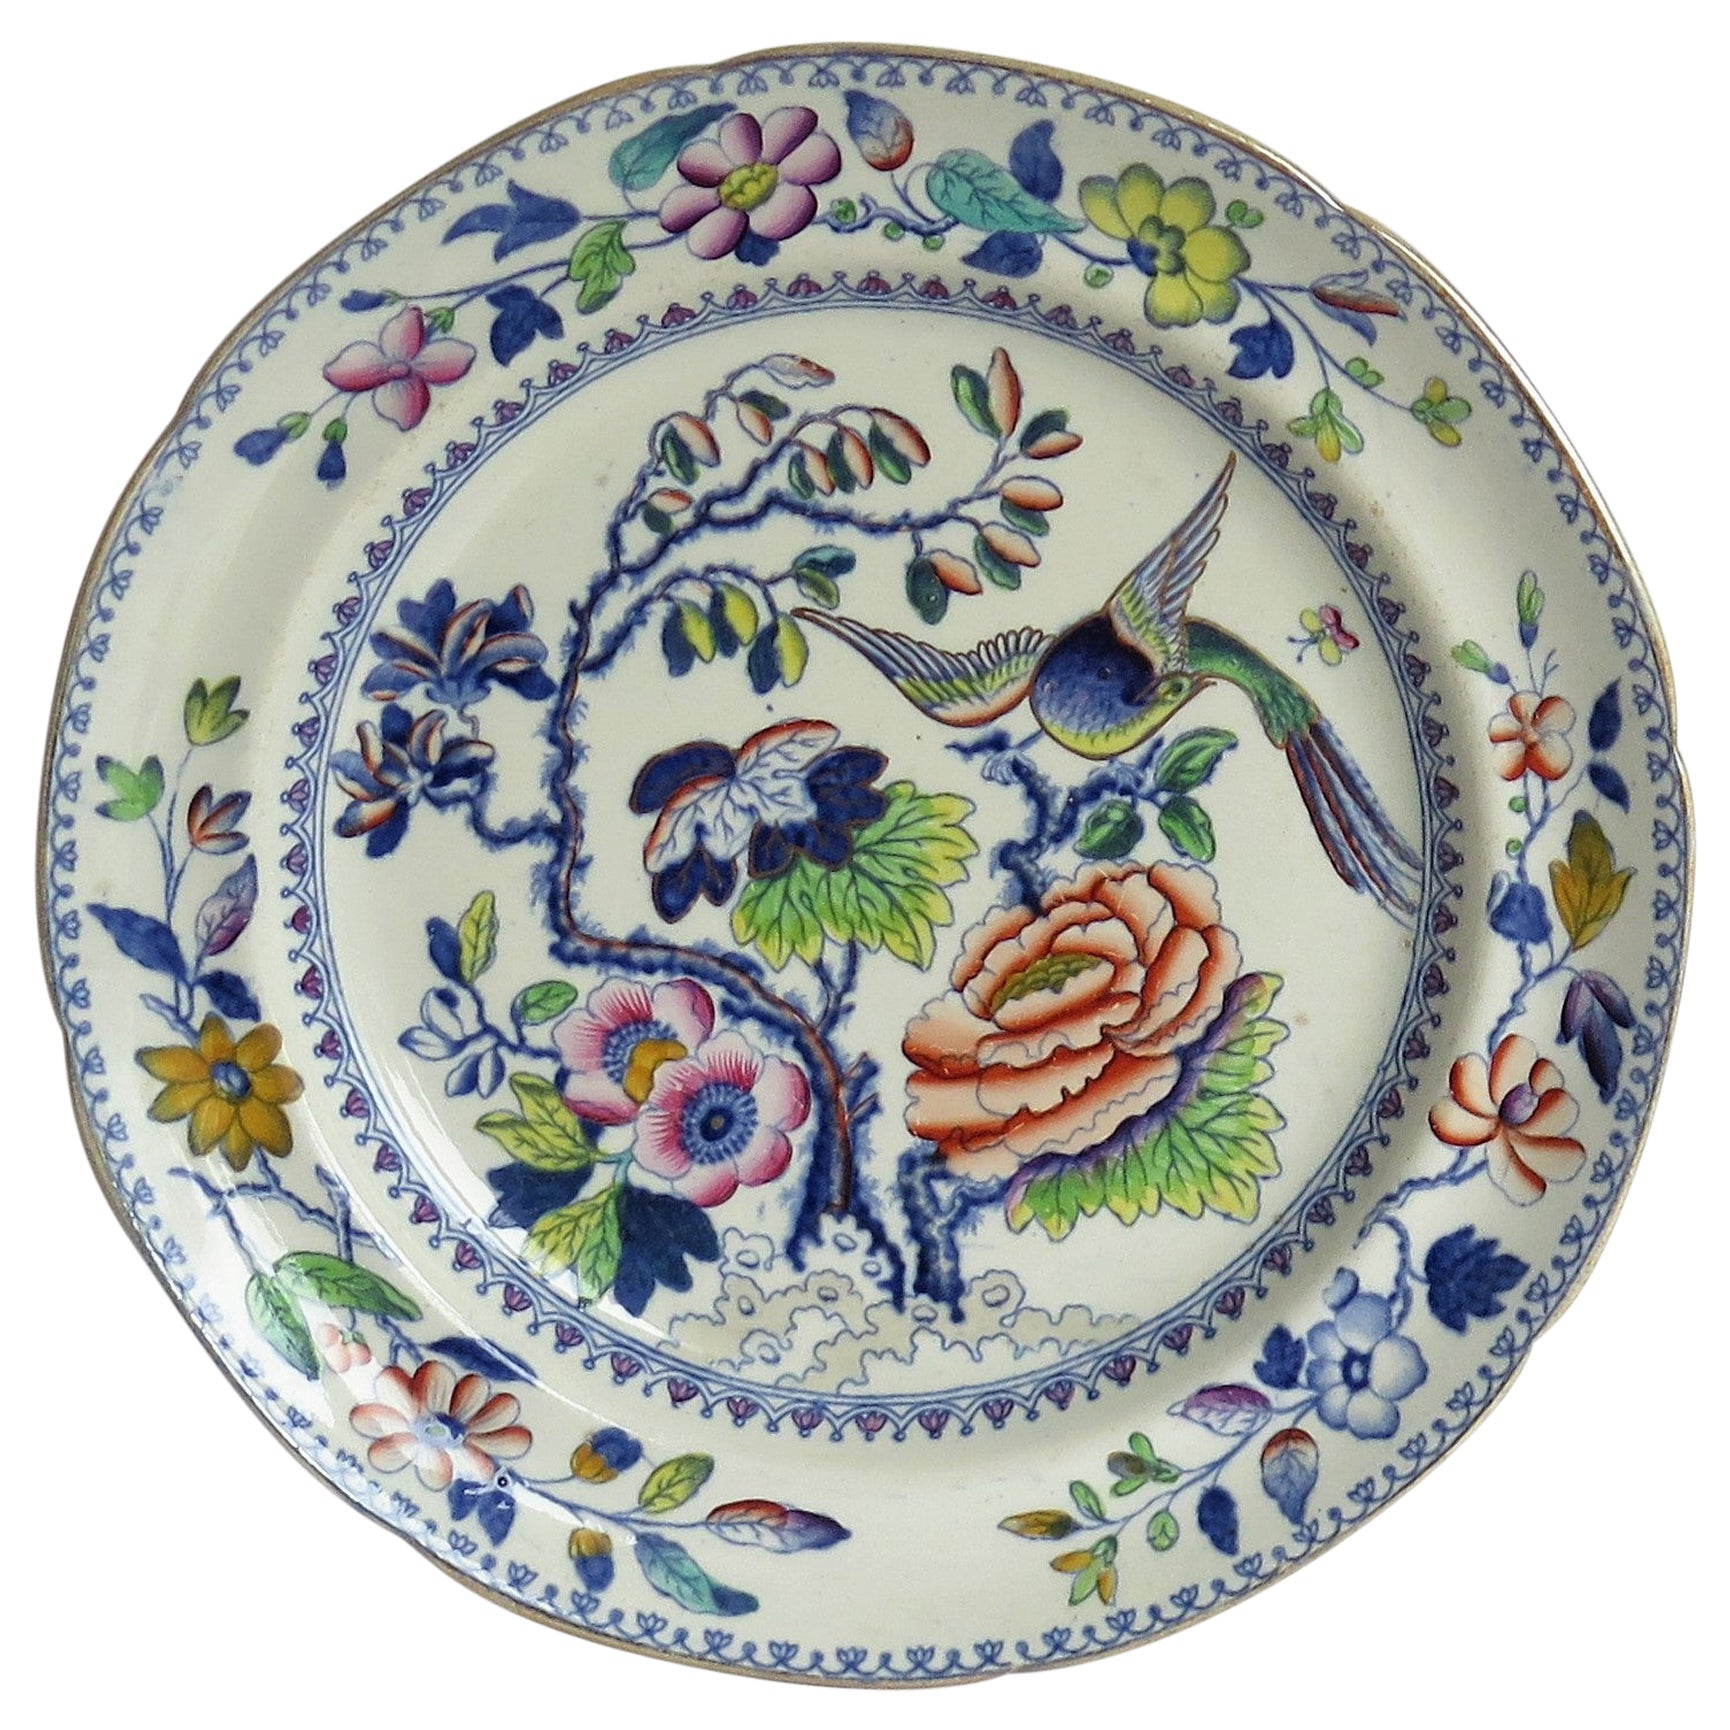 Georgian Ironstone Dinner Plate by Hicks Meigh & Johnson in Flying Bird Pattern